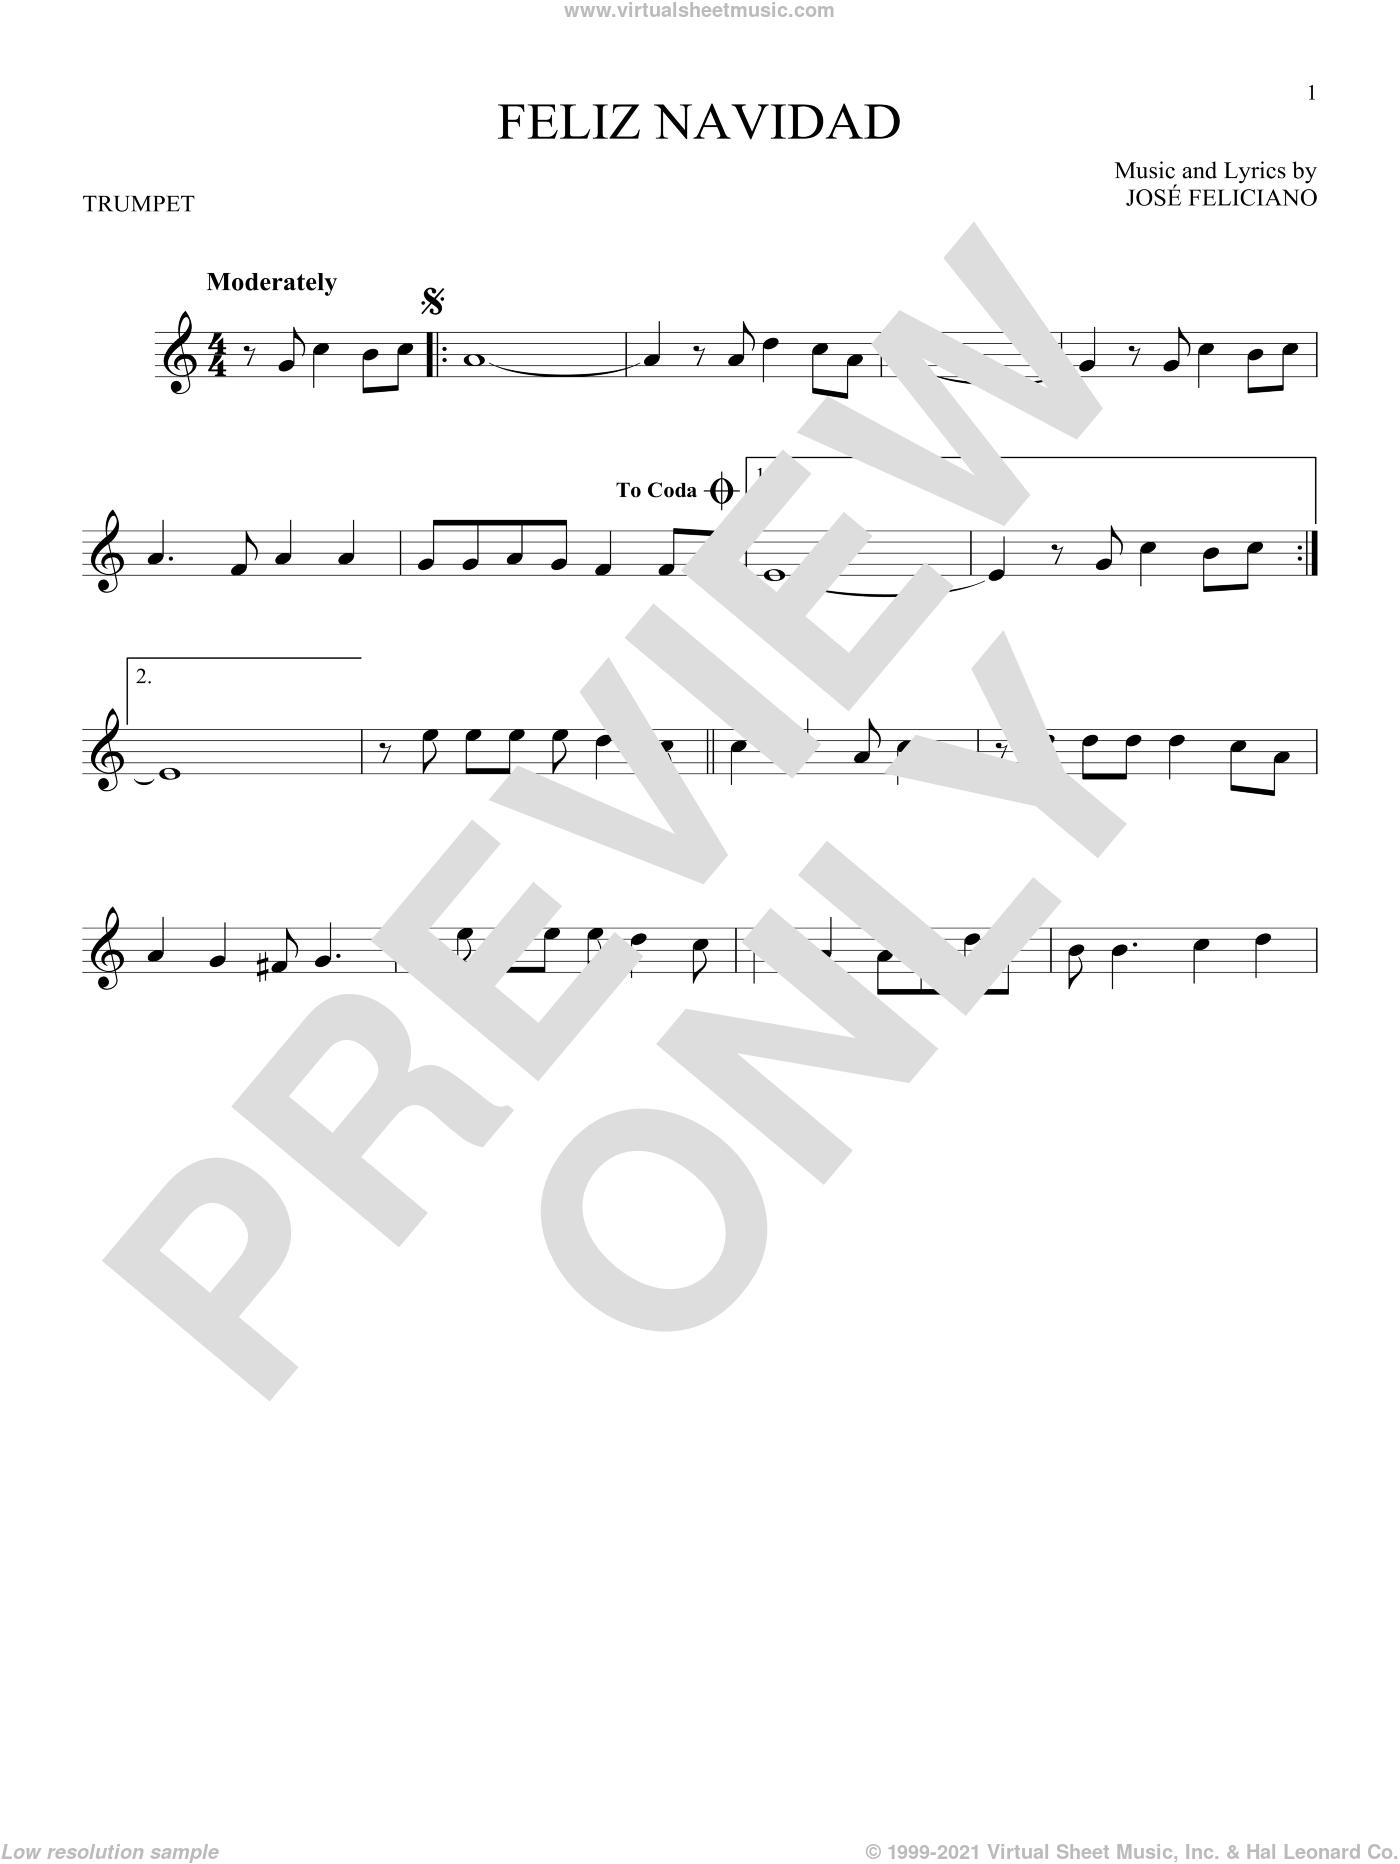 Feliz Navidad sheet music for trumpet solo by Jose Feliciano, intermediate skill level